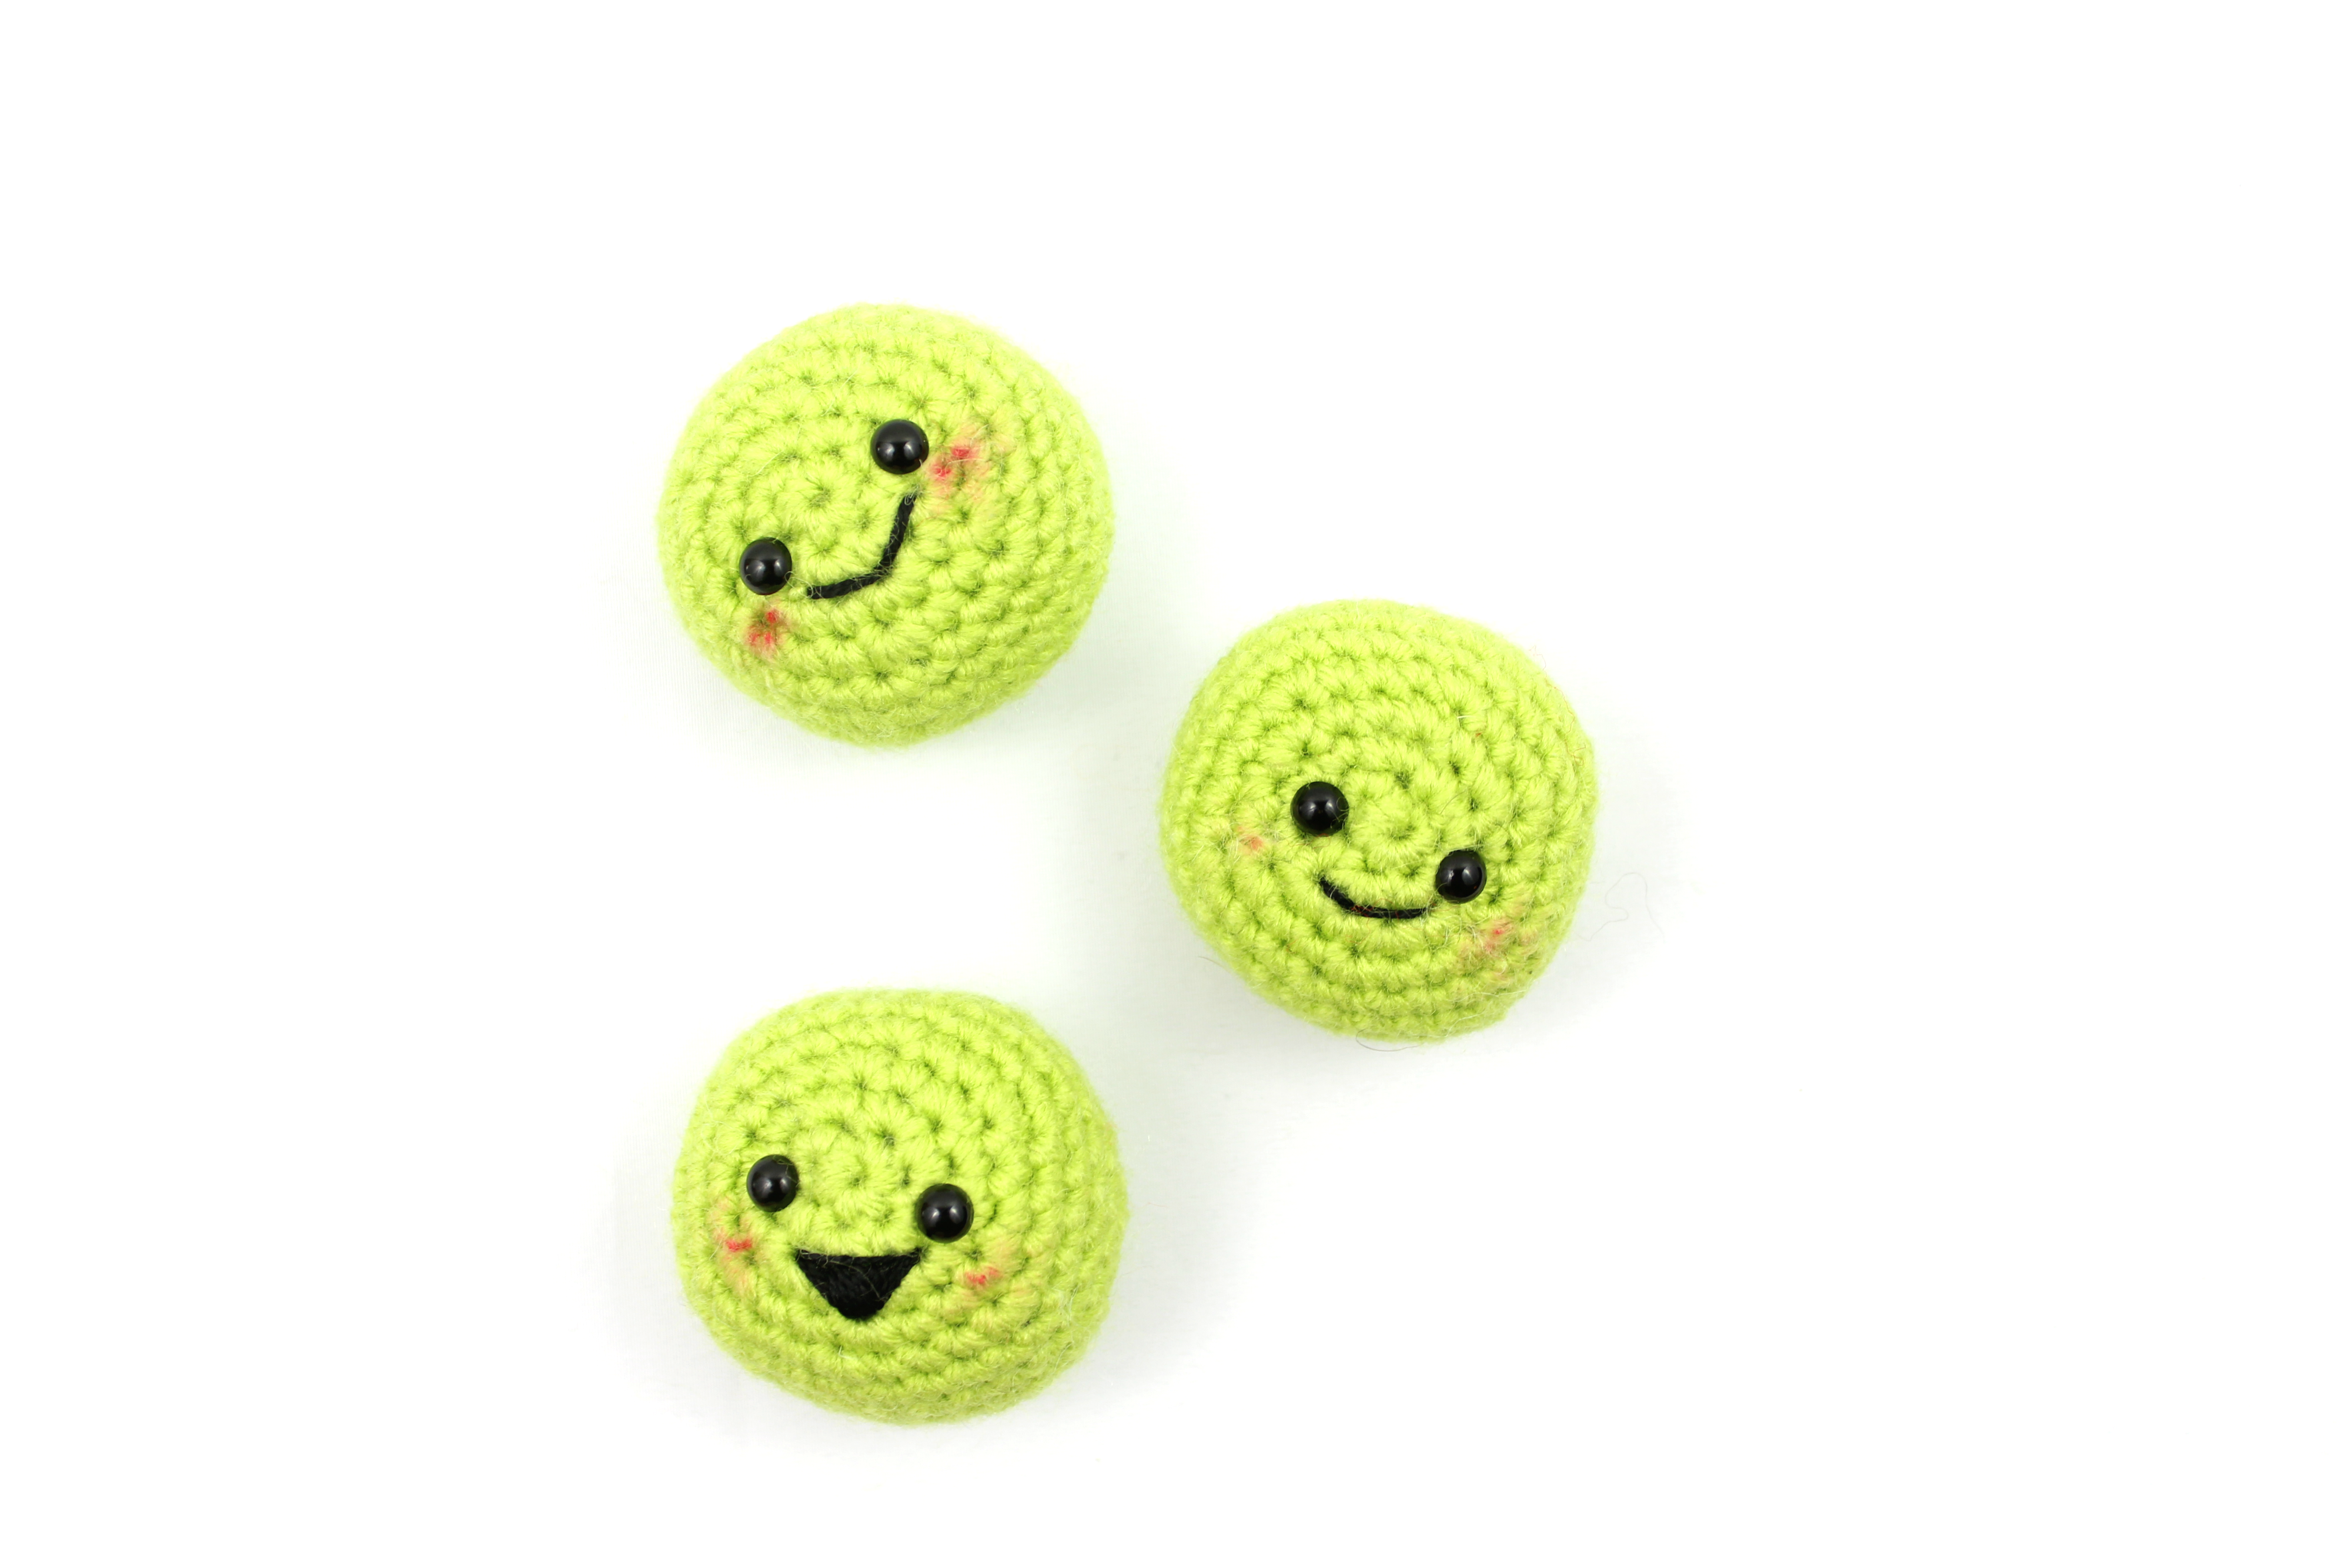 20 Free Patterns for Crochet Baby Cocoons • Oombawka Design Crochet | 2667x4000